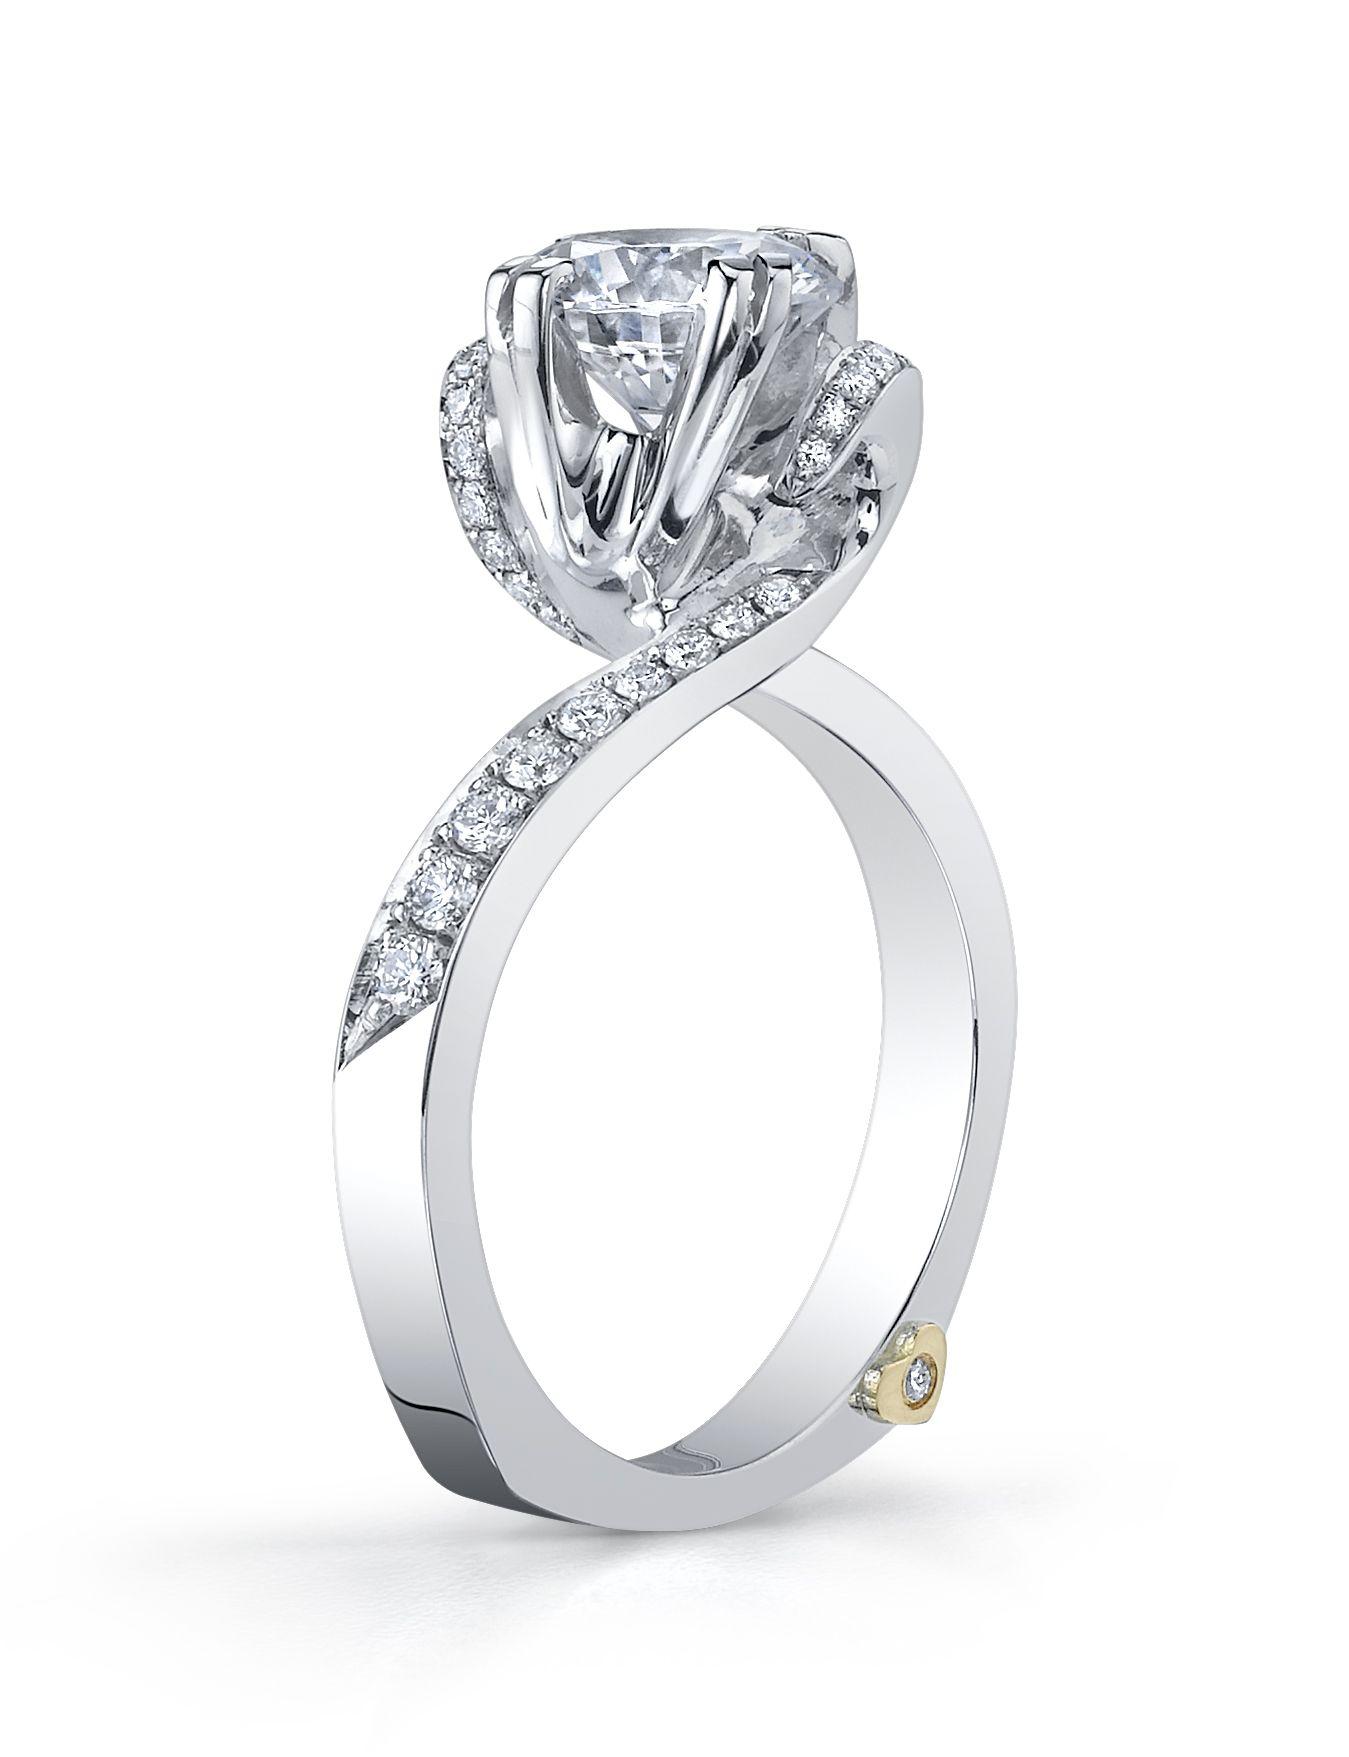 ultra modern wedding rings Most Popular Wedding Ring Questions